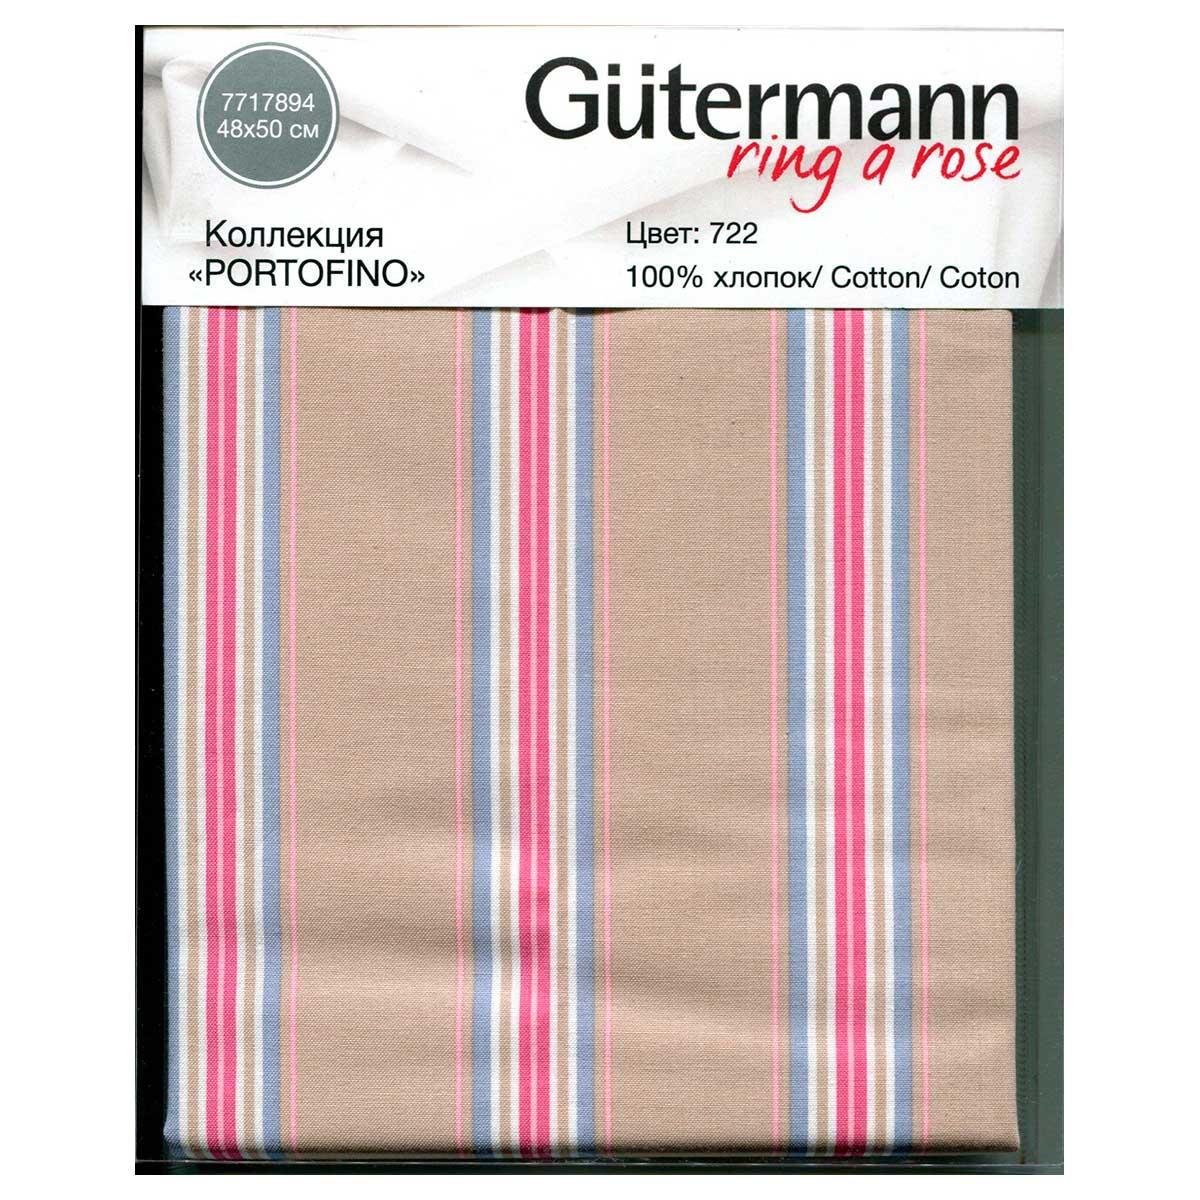 647578 Ткань коллекция 'Portofino', 48х50см, 100% хлопок Гутерманн